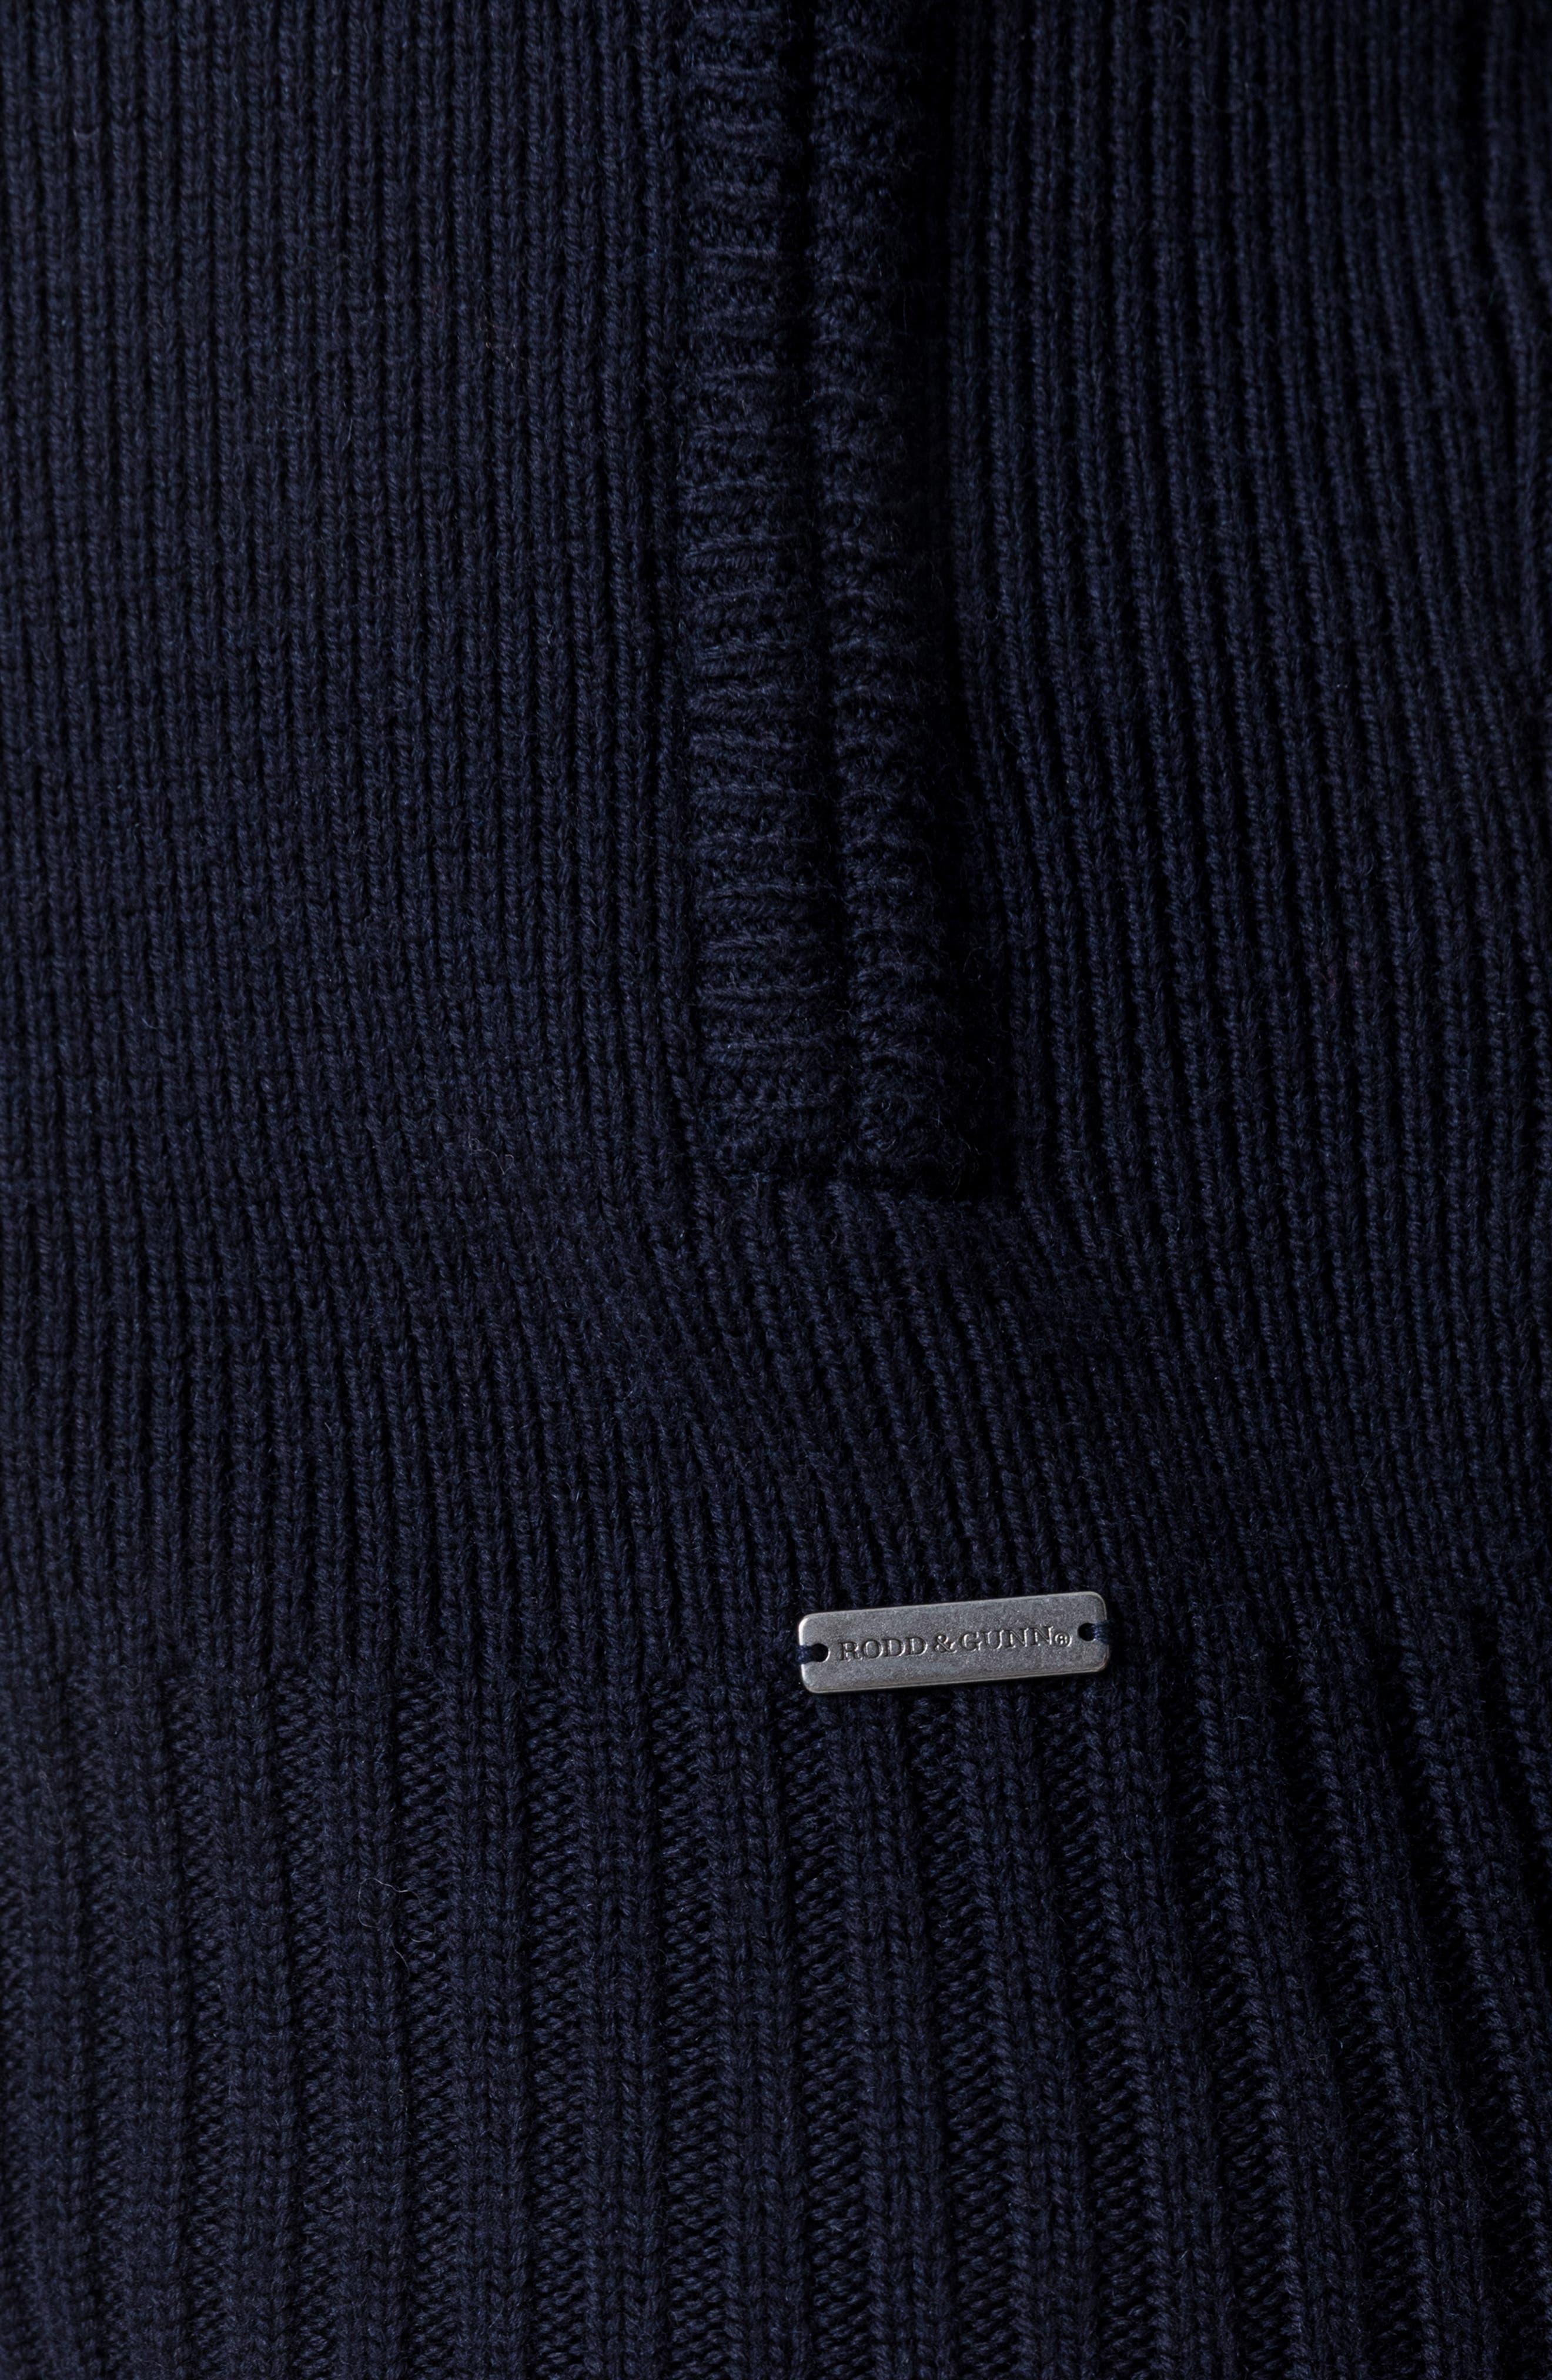 Kina Beach Merino Wool Zip Sweater,                             Alternate thumbnail 4, color,                             400